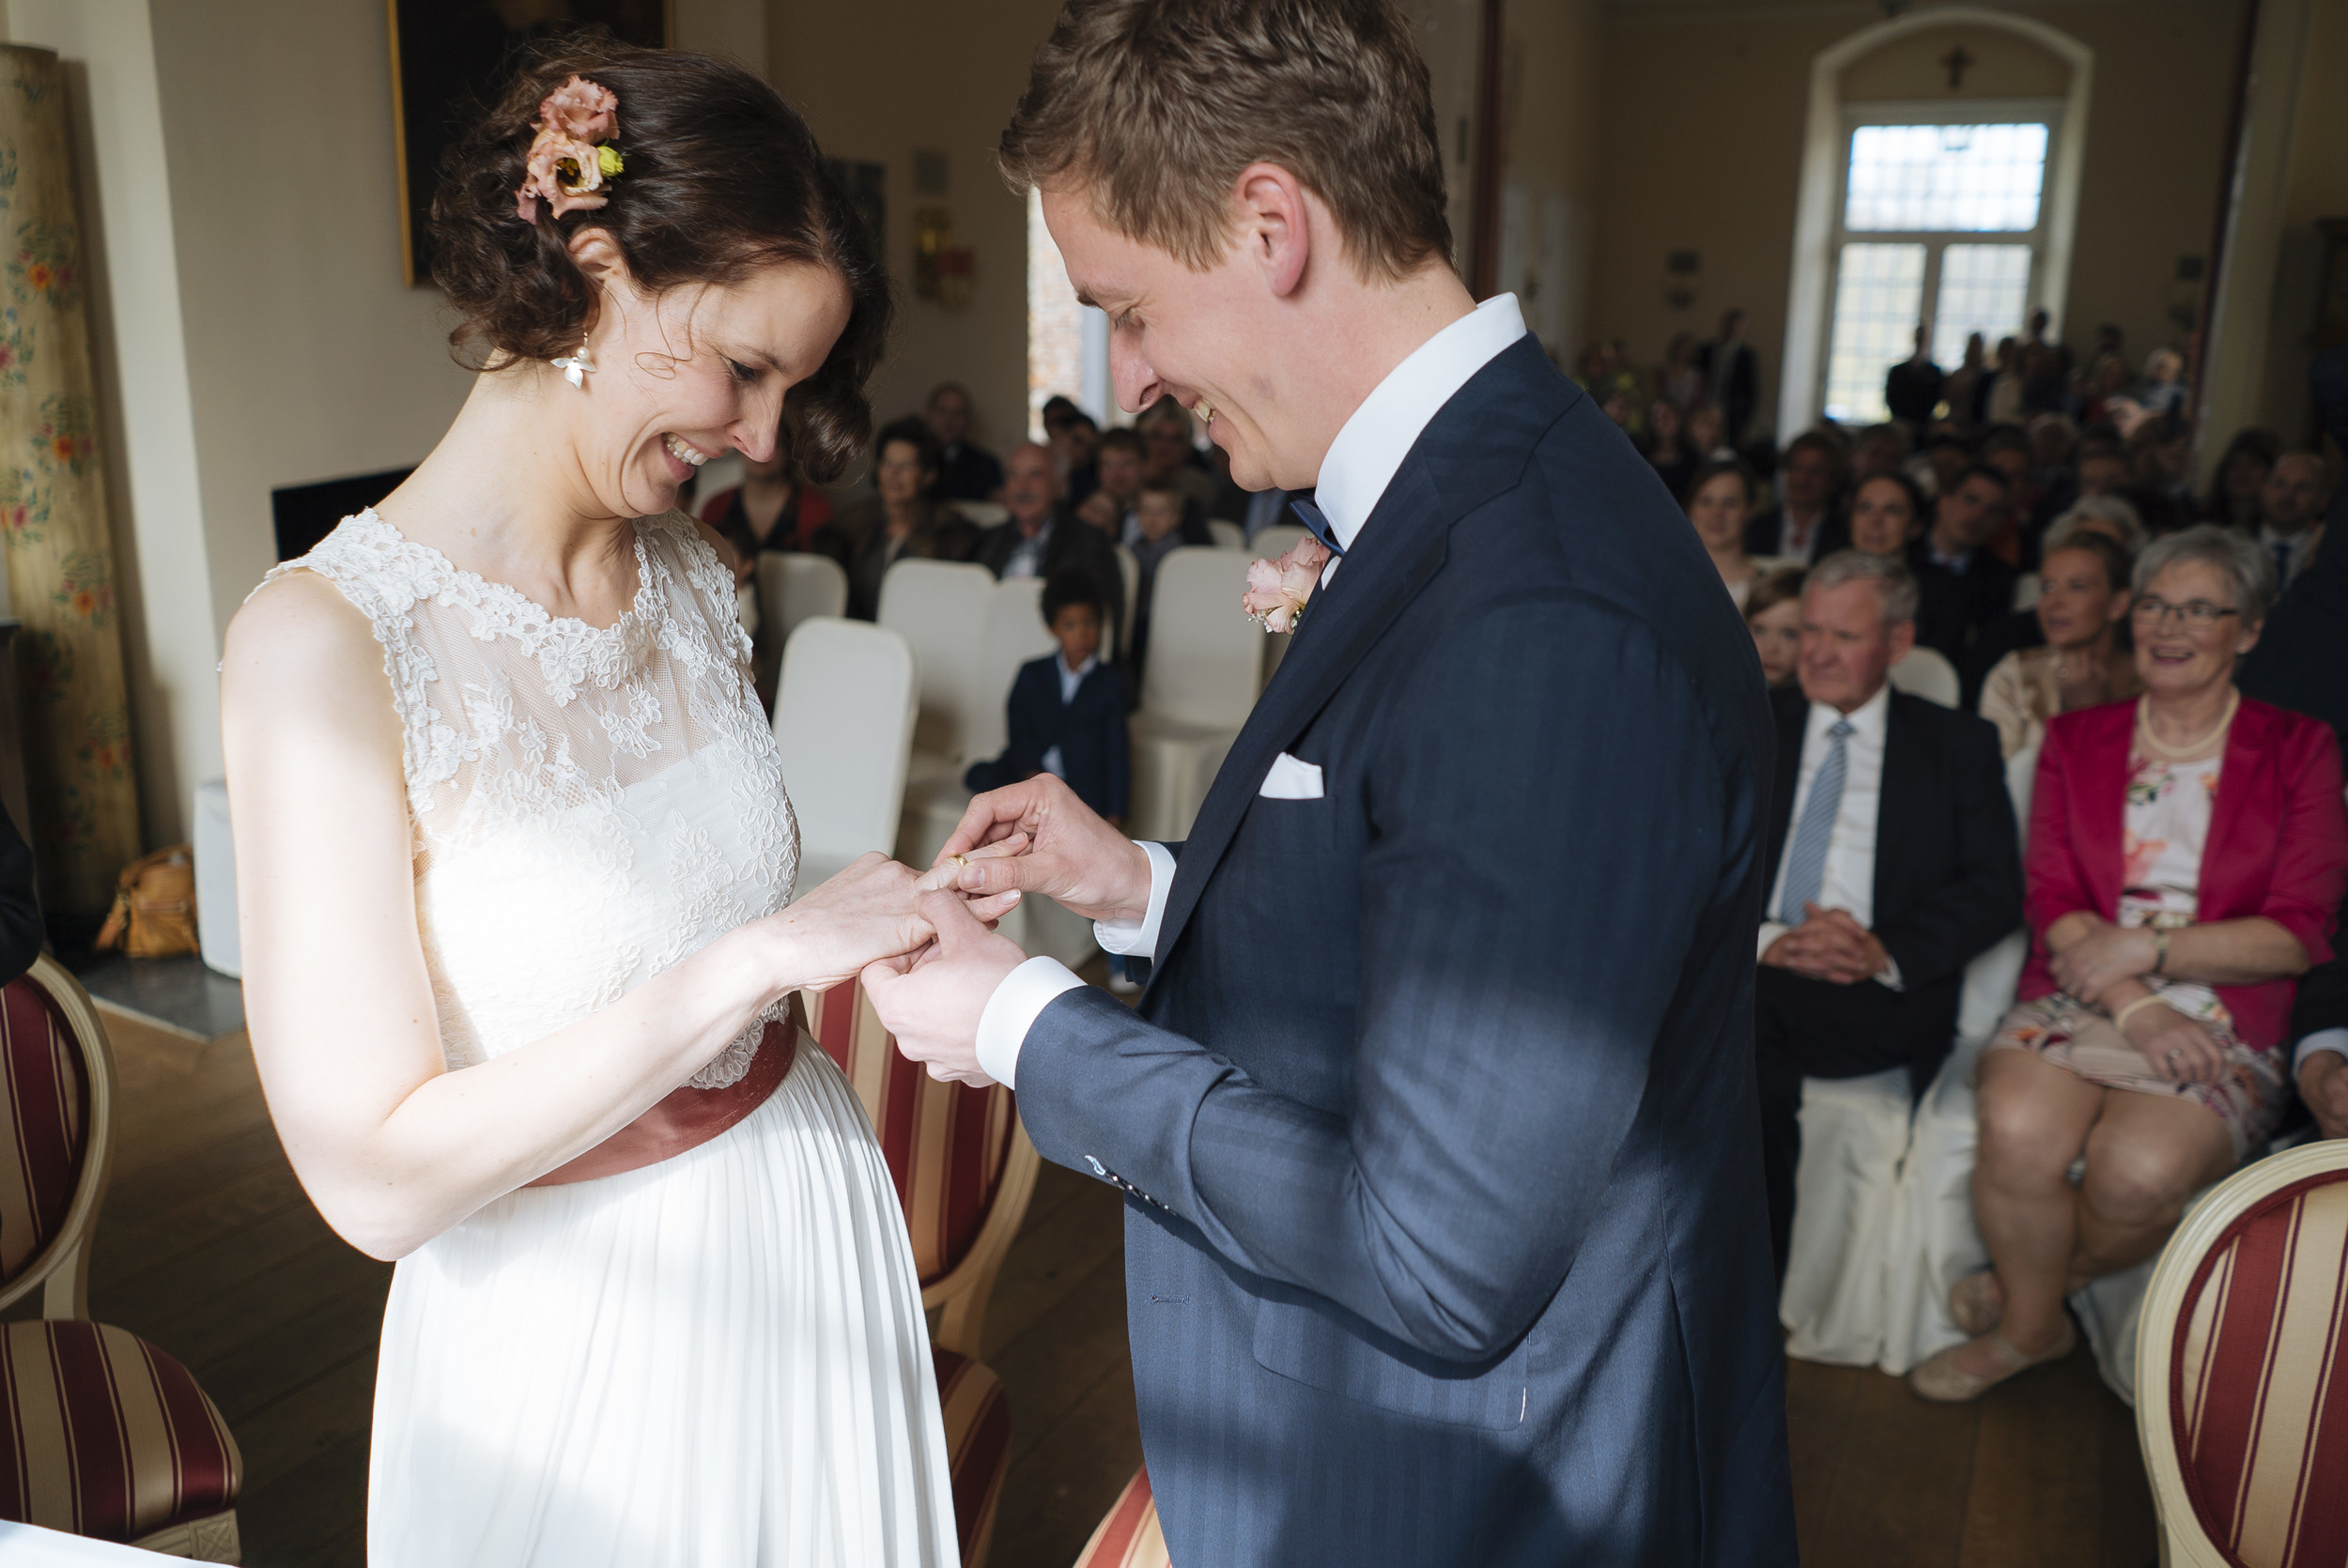 Hochzeitsfotograf-Schlossruine-Hertefeld-Weeze-078.jpg